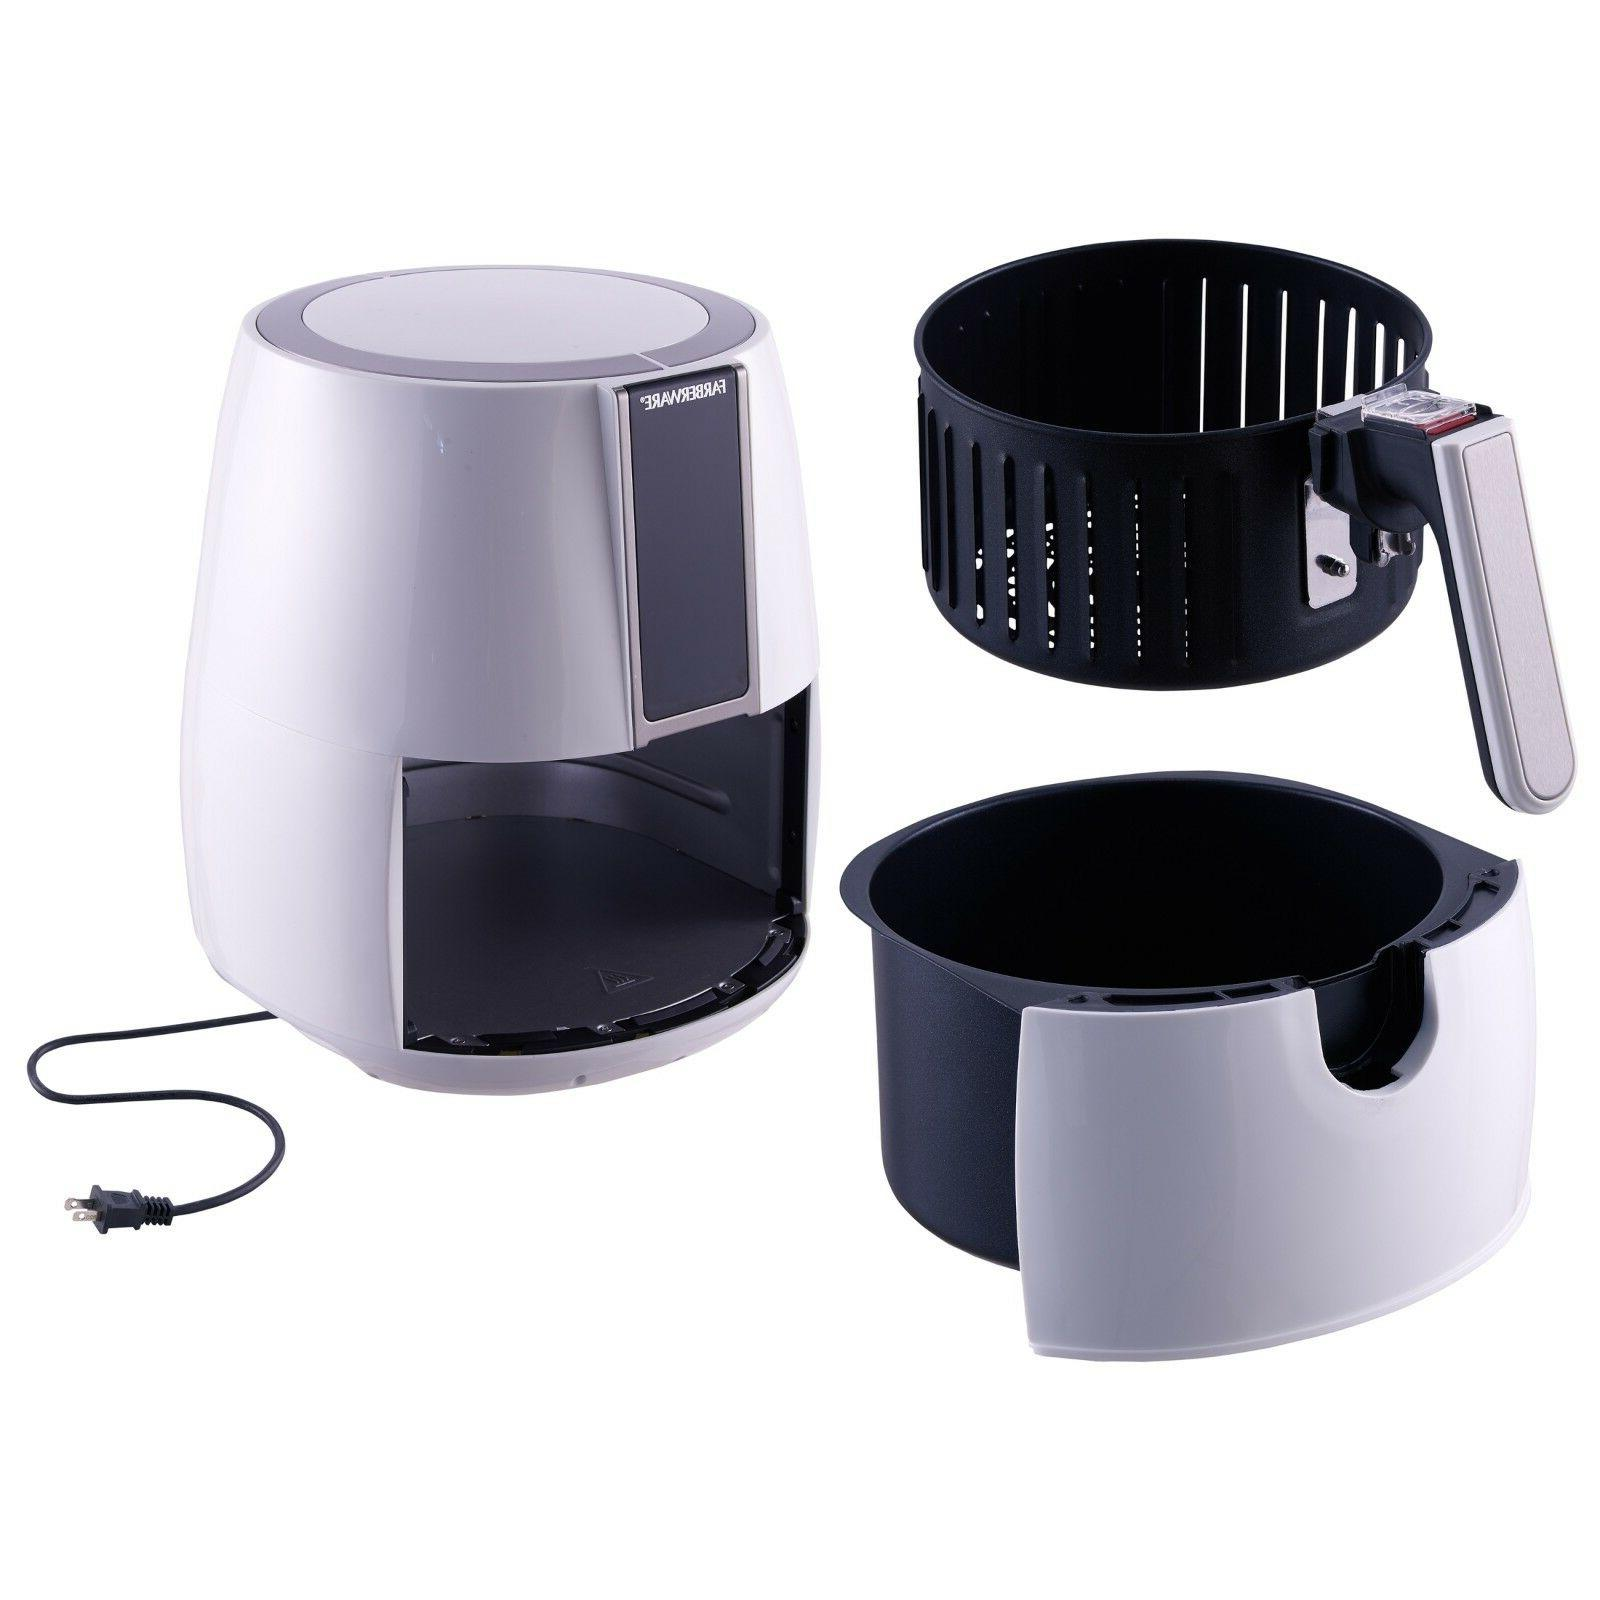 Electric Fryer 3.2Quart White